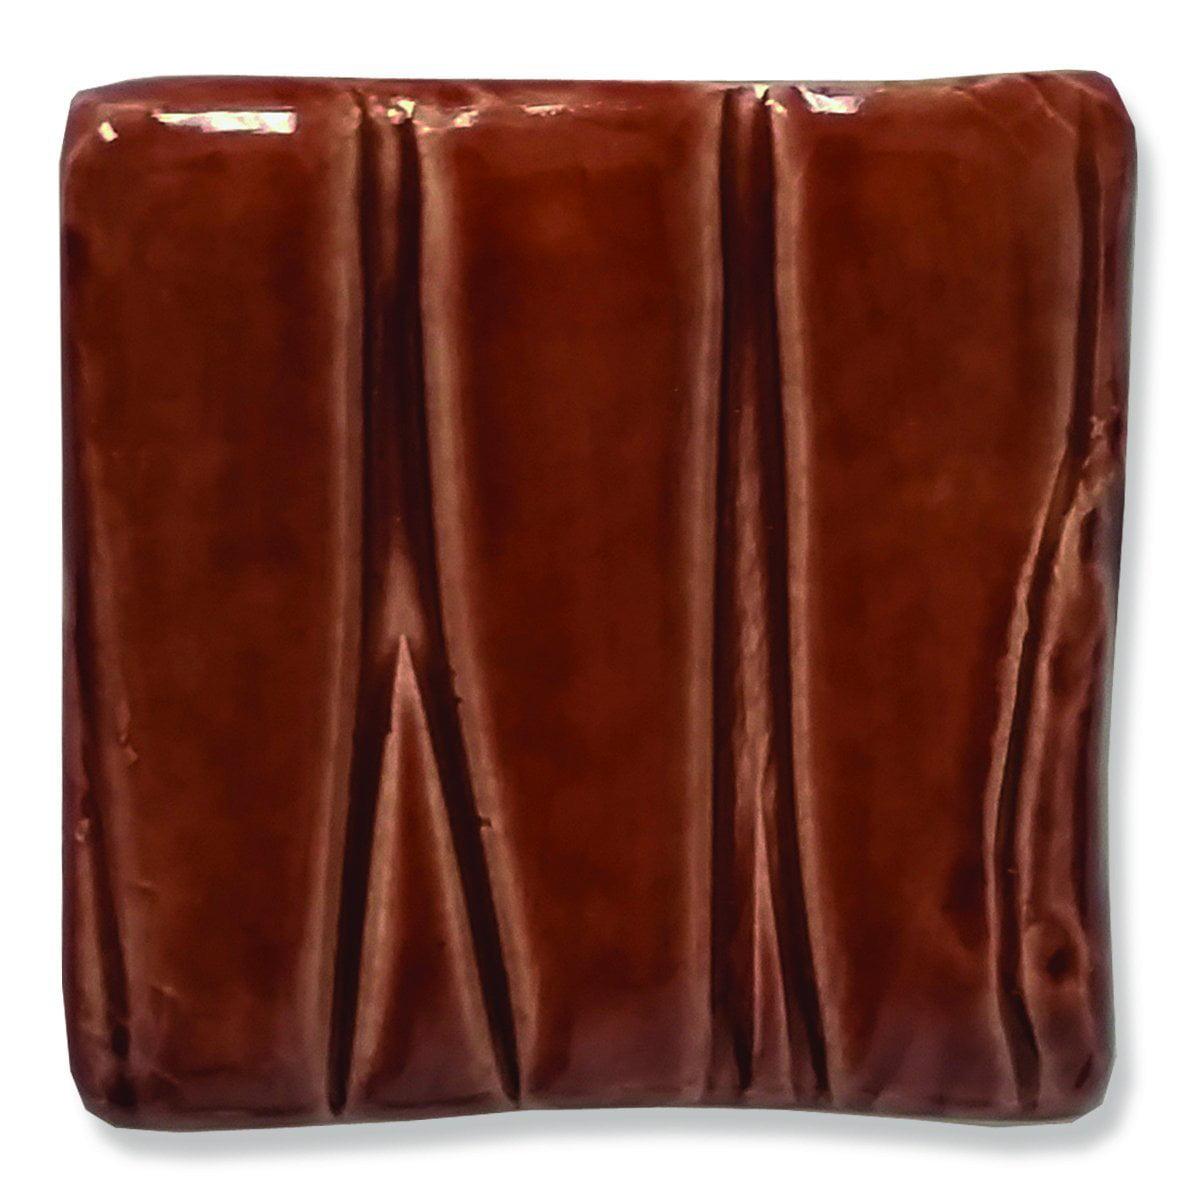 Speedball Art 16 oz. (pint) Earthenware Glaze--Brown